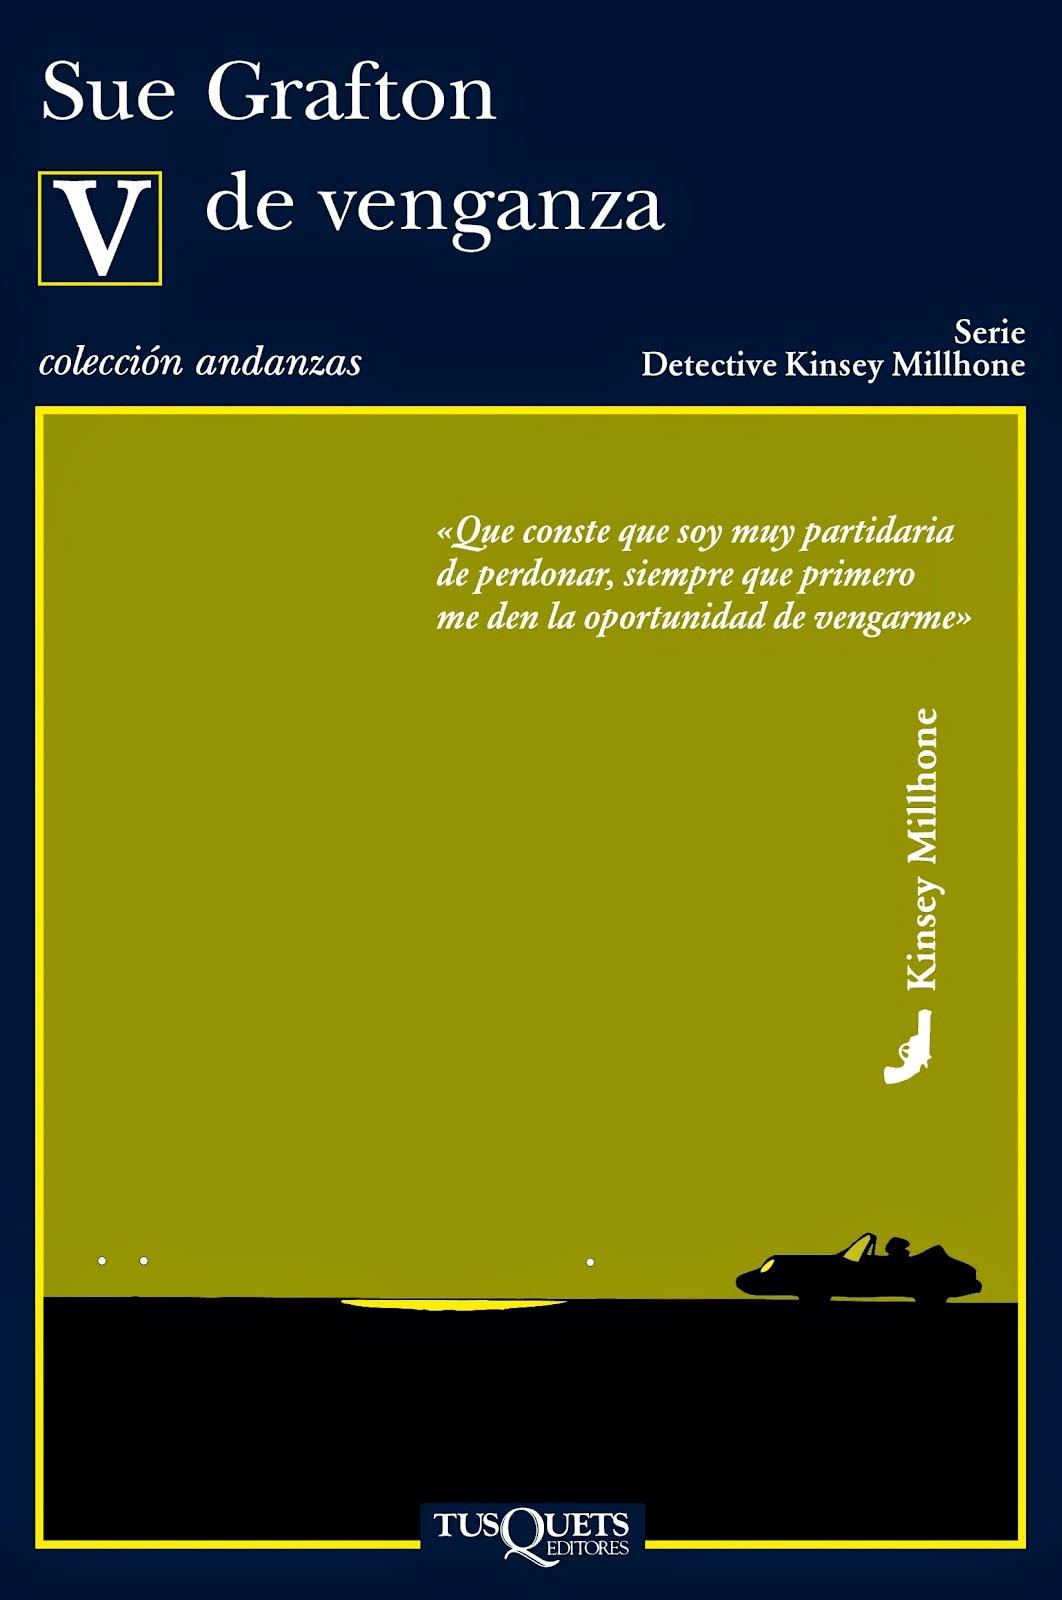 http://www.tusquetseditores.com/titulos/andanzas-v-de-venganza